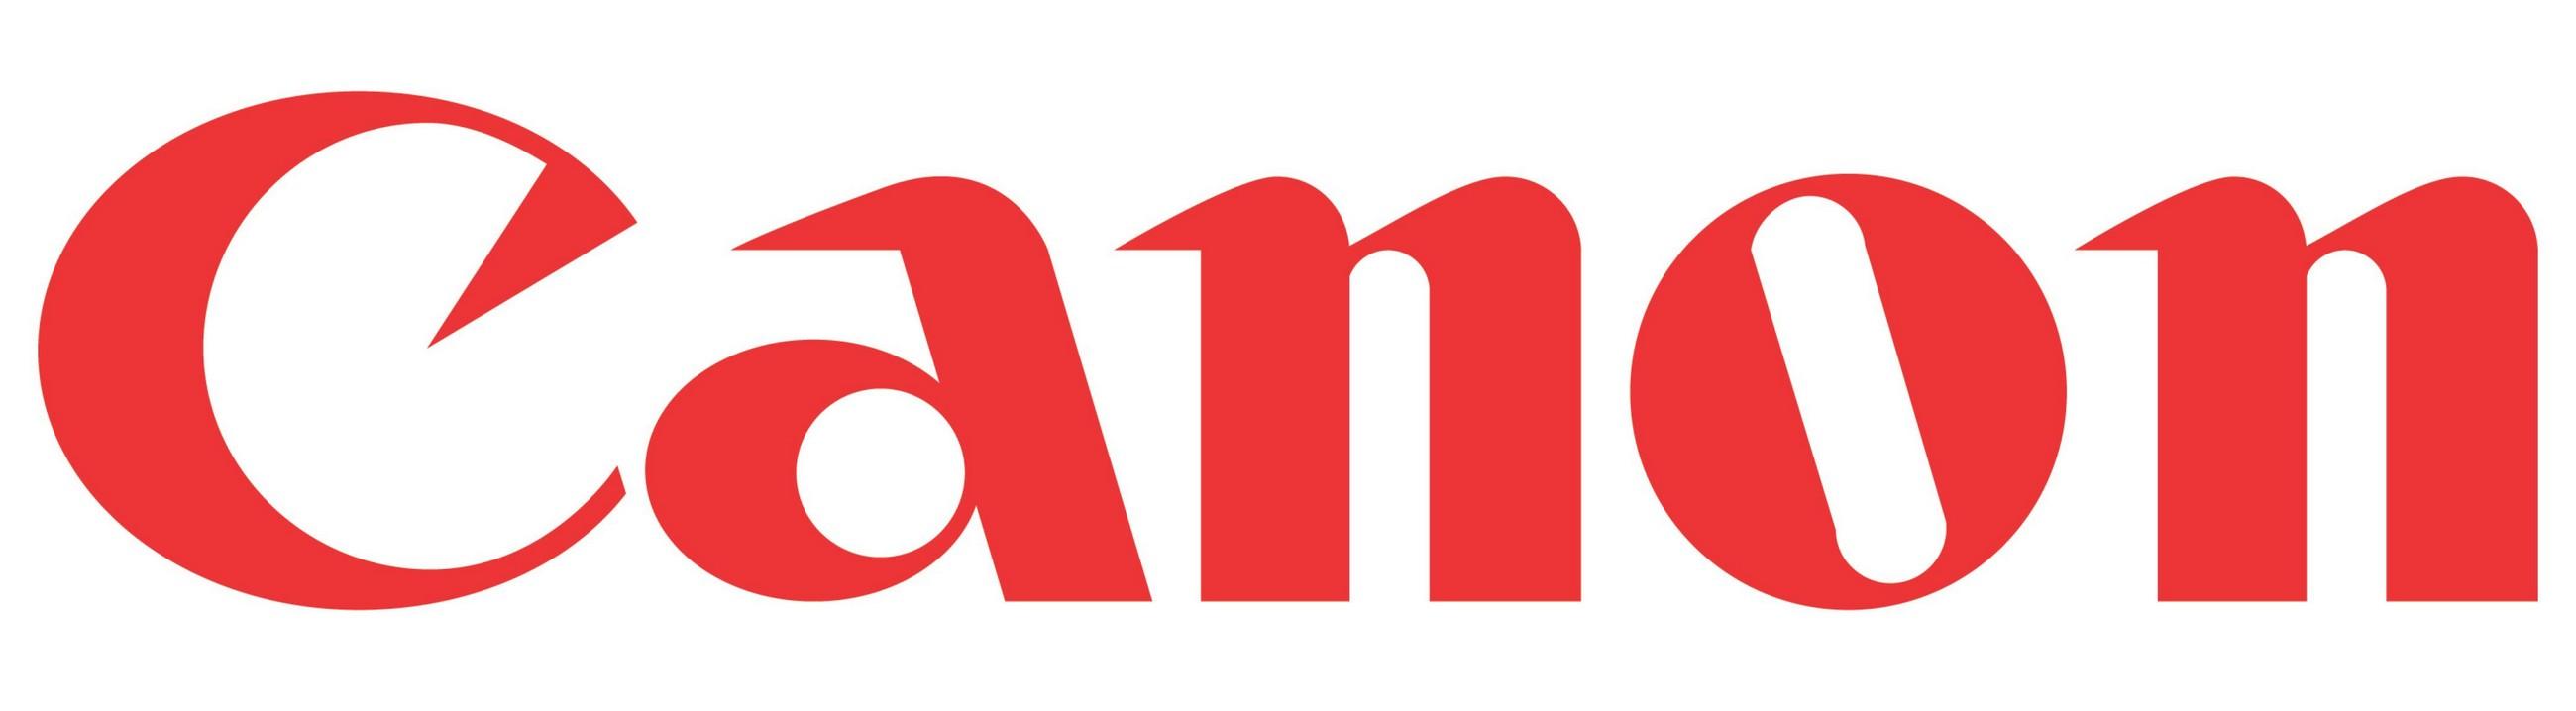 Canon PlusPng.com  - Canon Logo Eps PNG